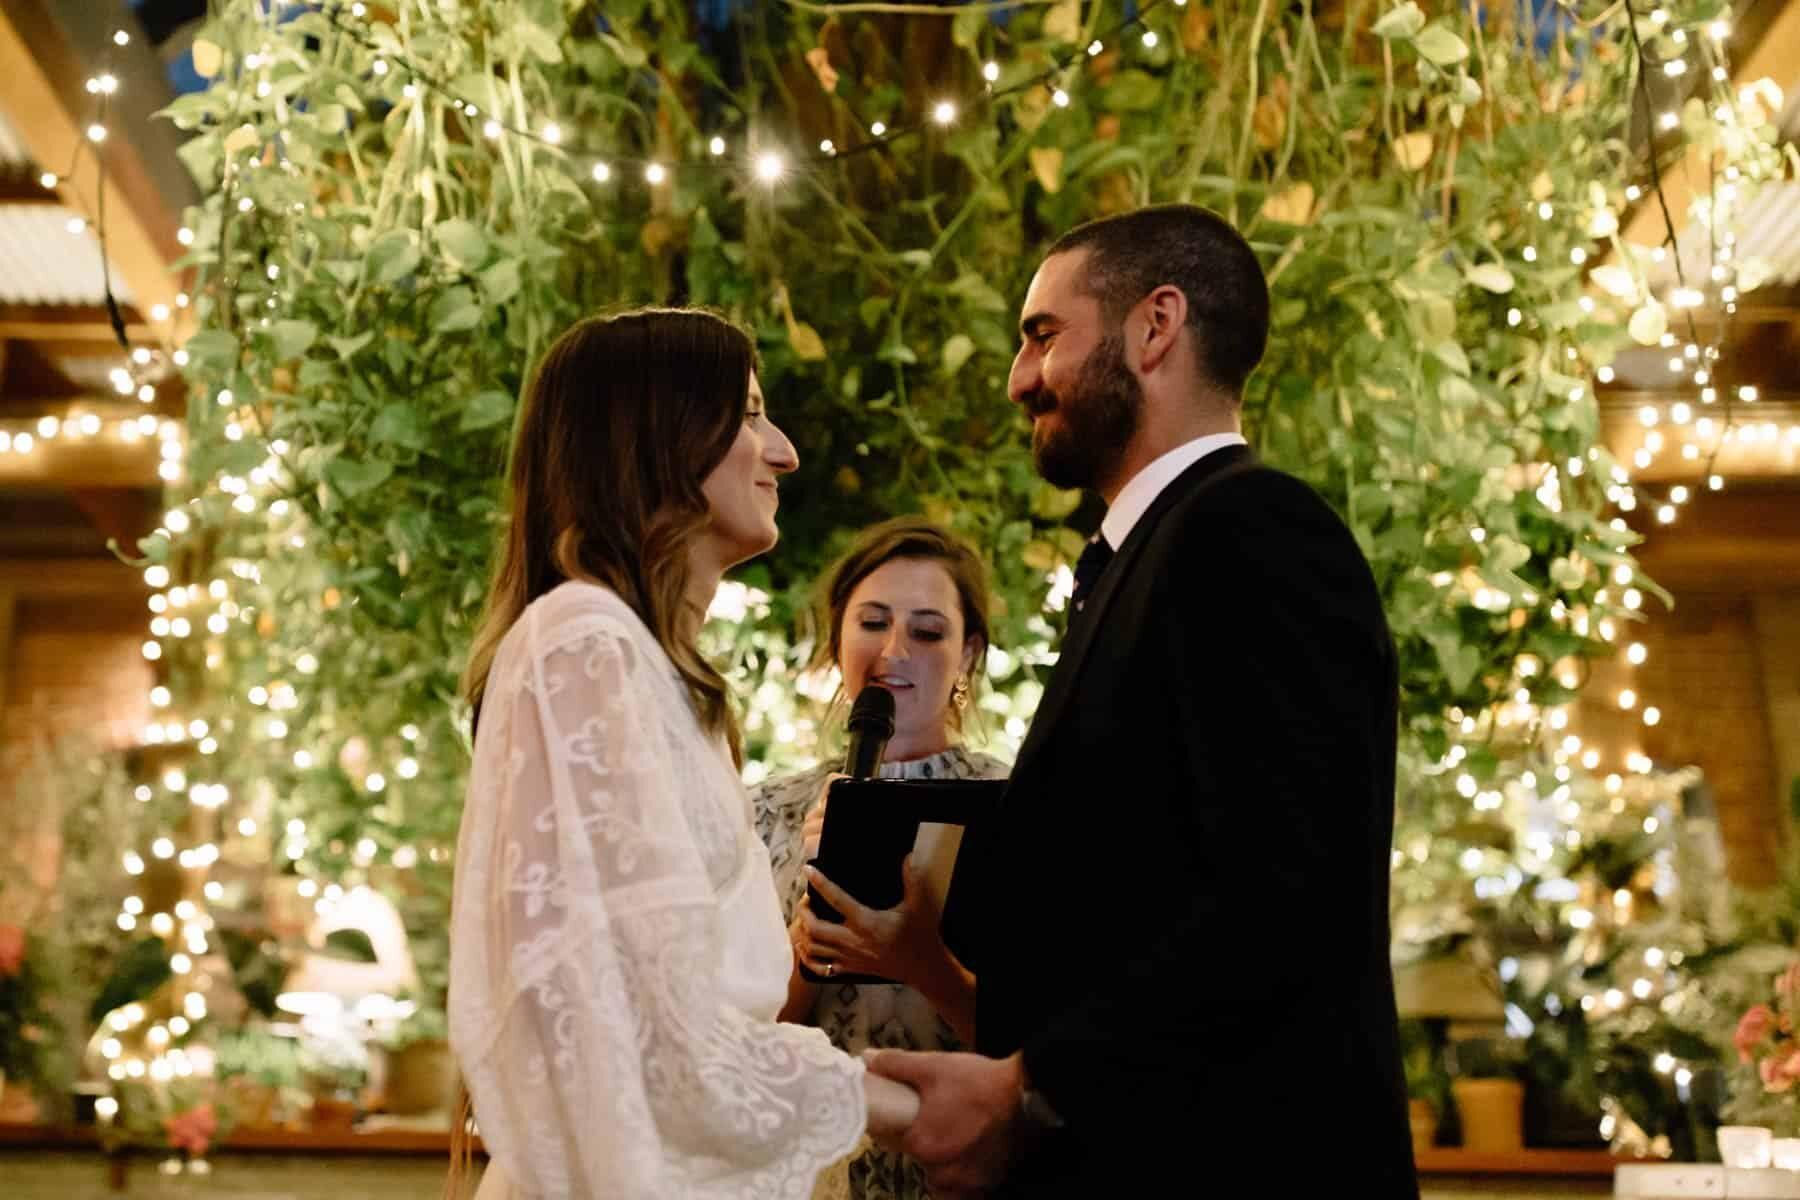 Surprise twilight wedding at The Grounds of Alexandria, Sydney / Photography by Matt Godkin